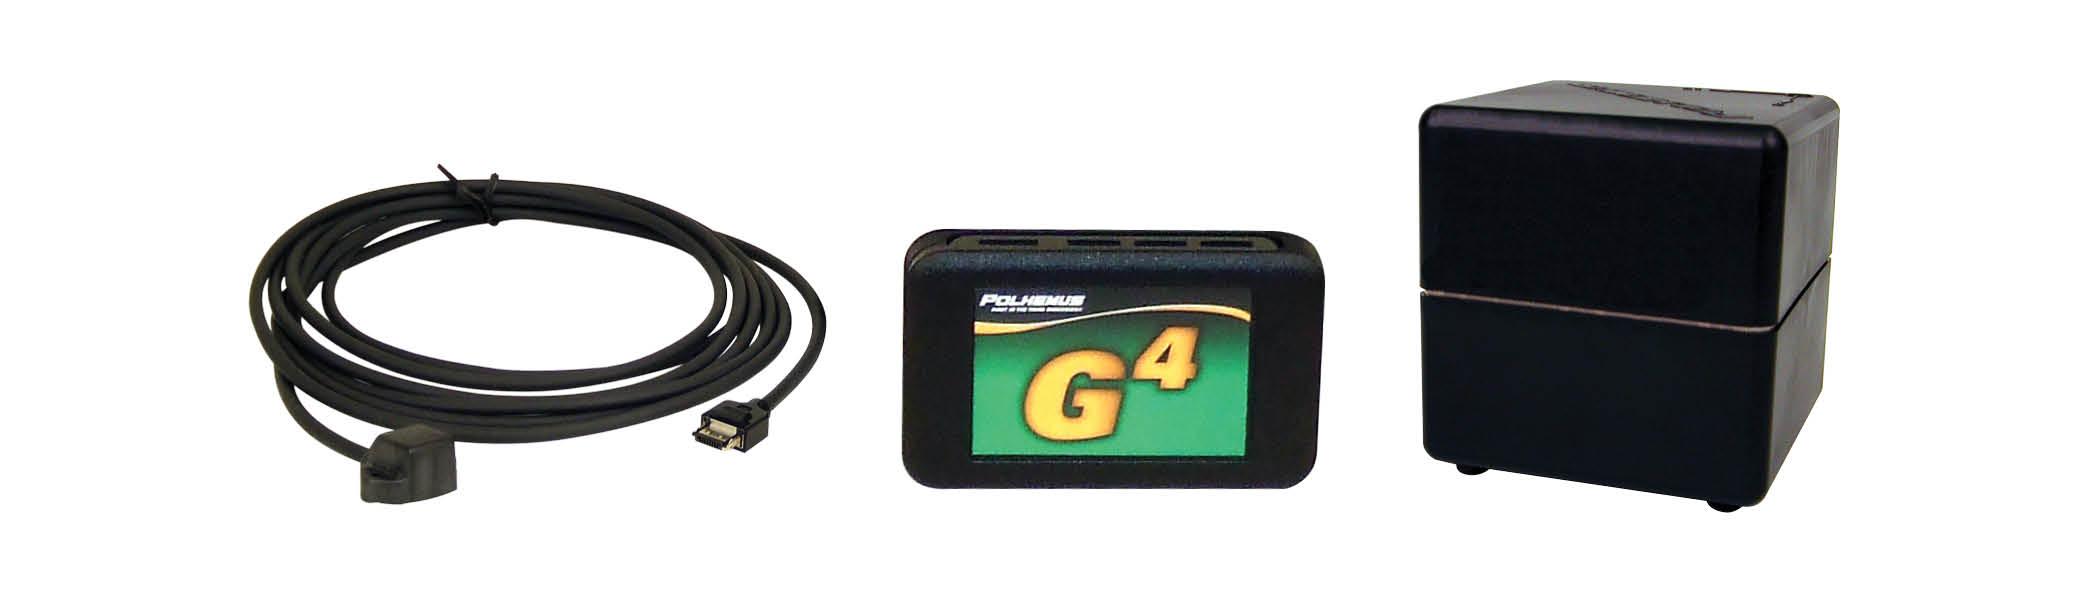 Polhemus G4 wireless motion tracking system